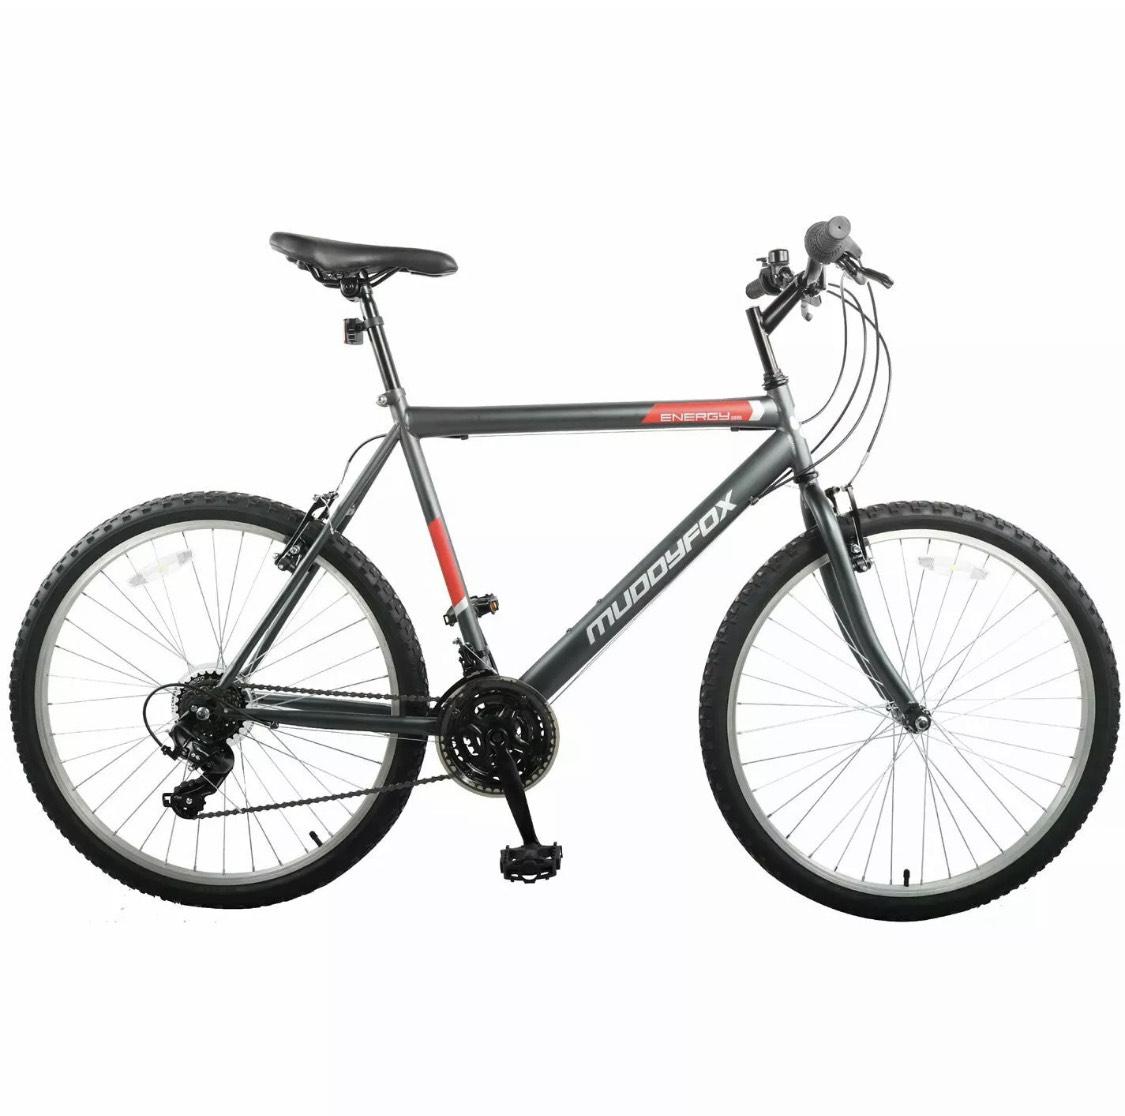 Muddyfox Energy26 18 Speed Mountain Bike £111.20 (£4.99 delivery) @ Sports direct / eBay